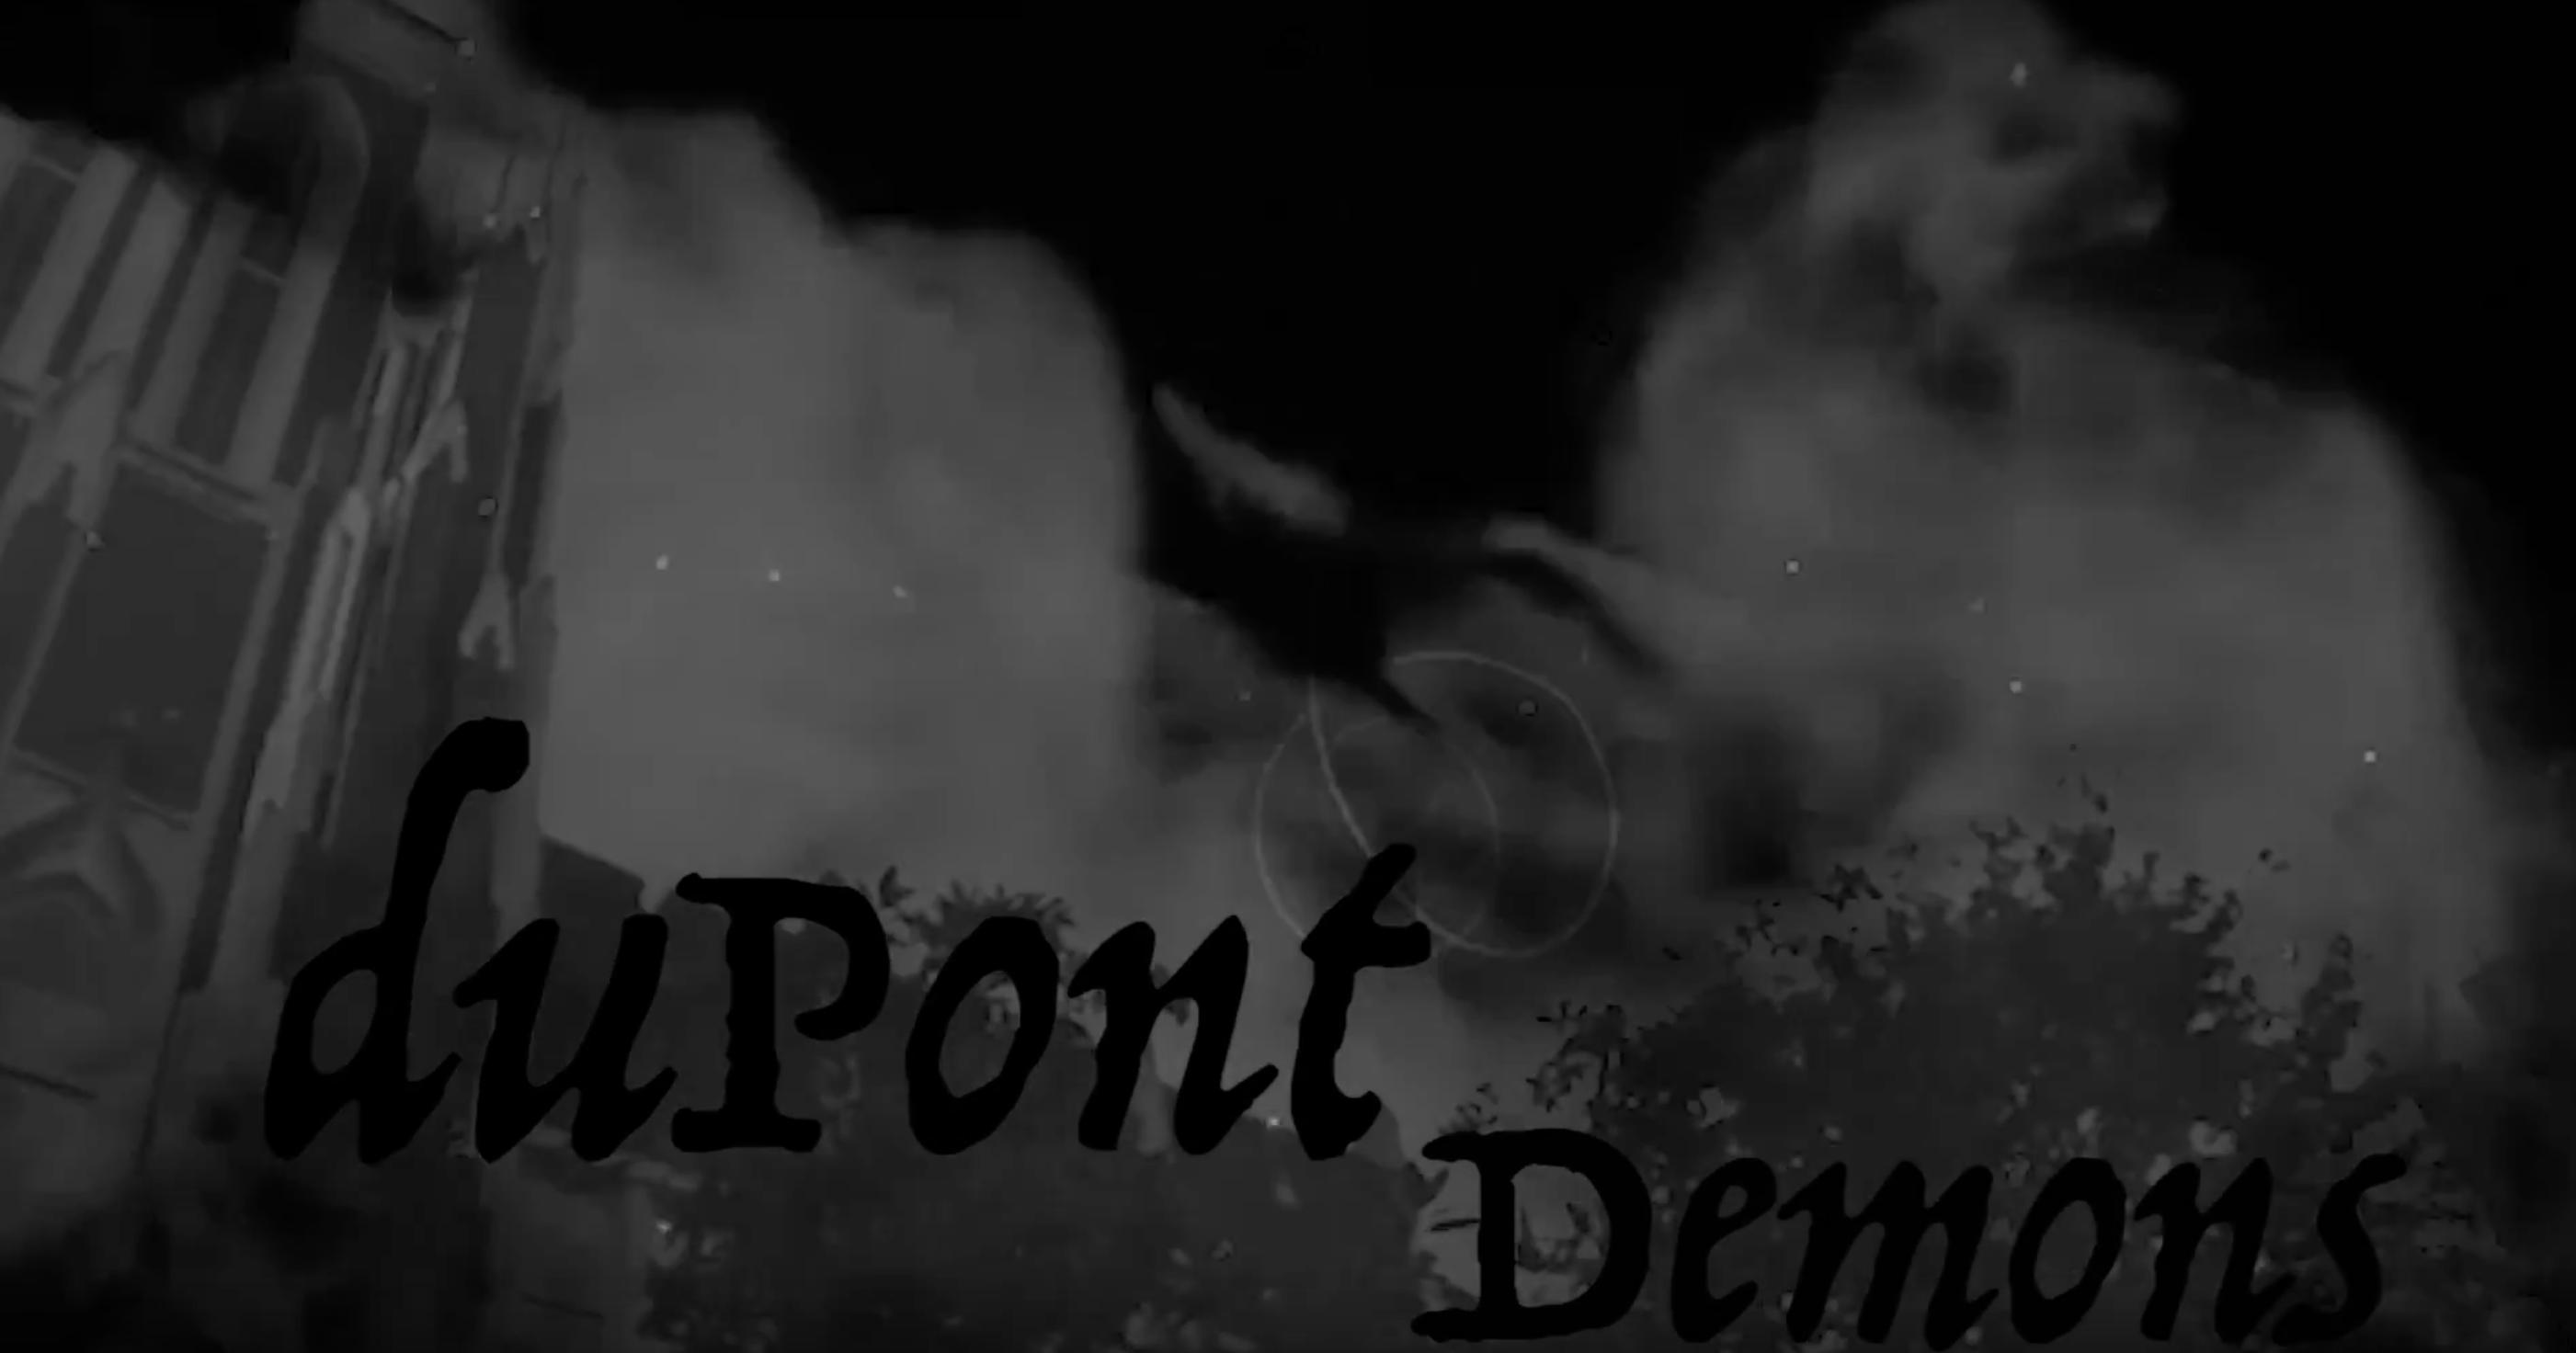 CSPN-TV: duPont Demons